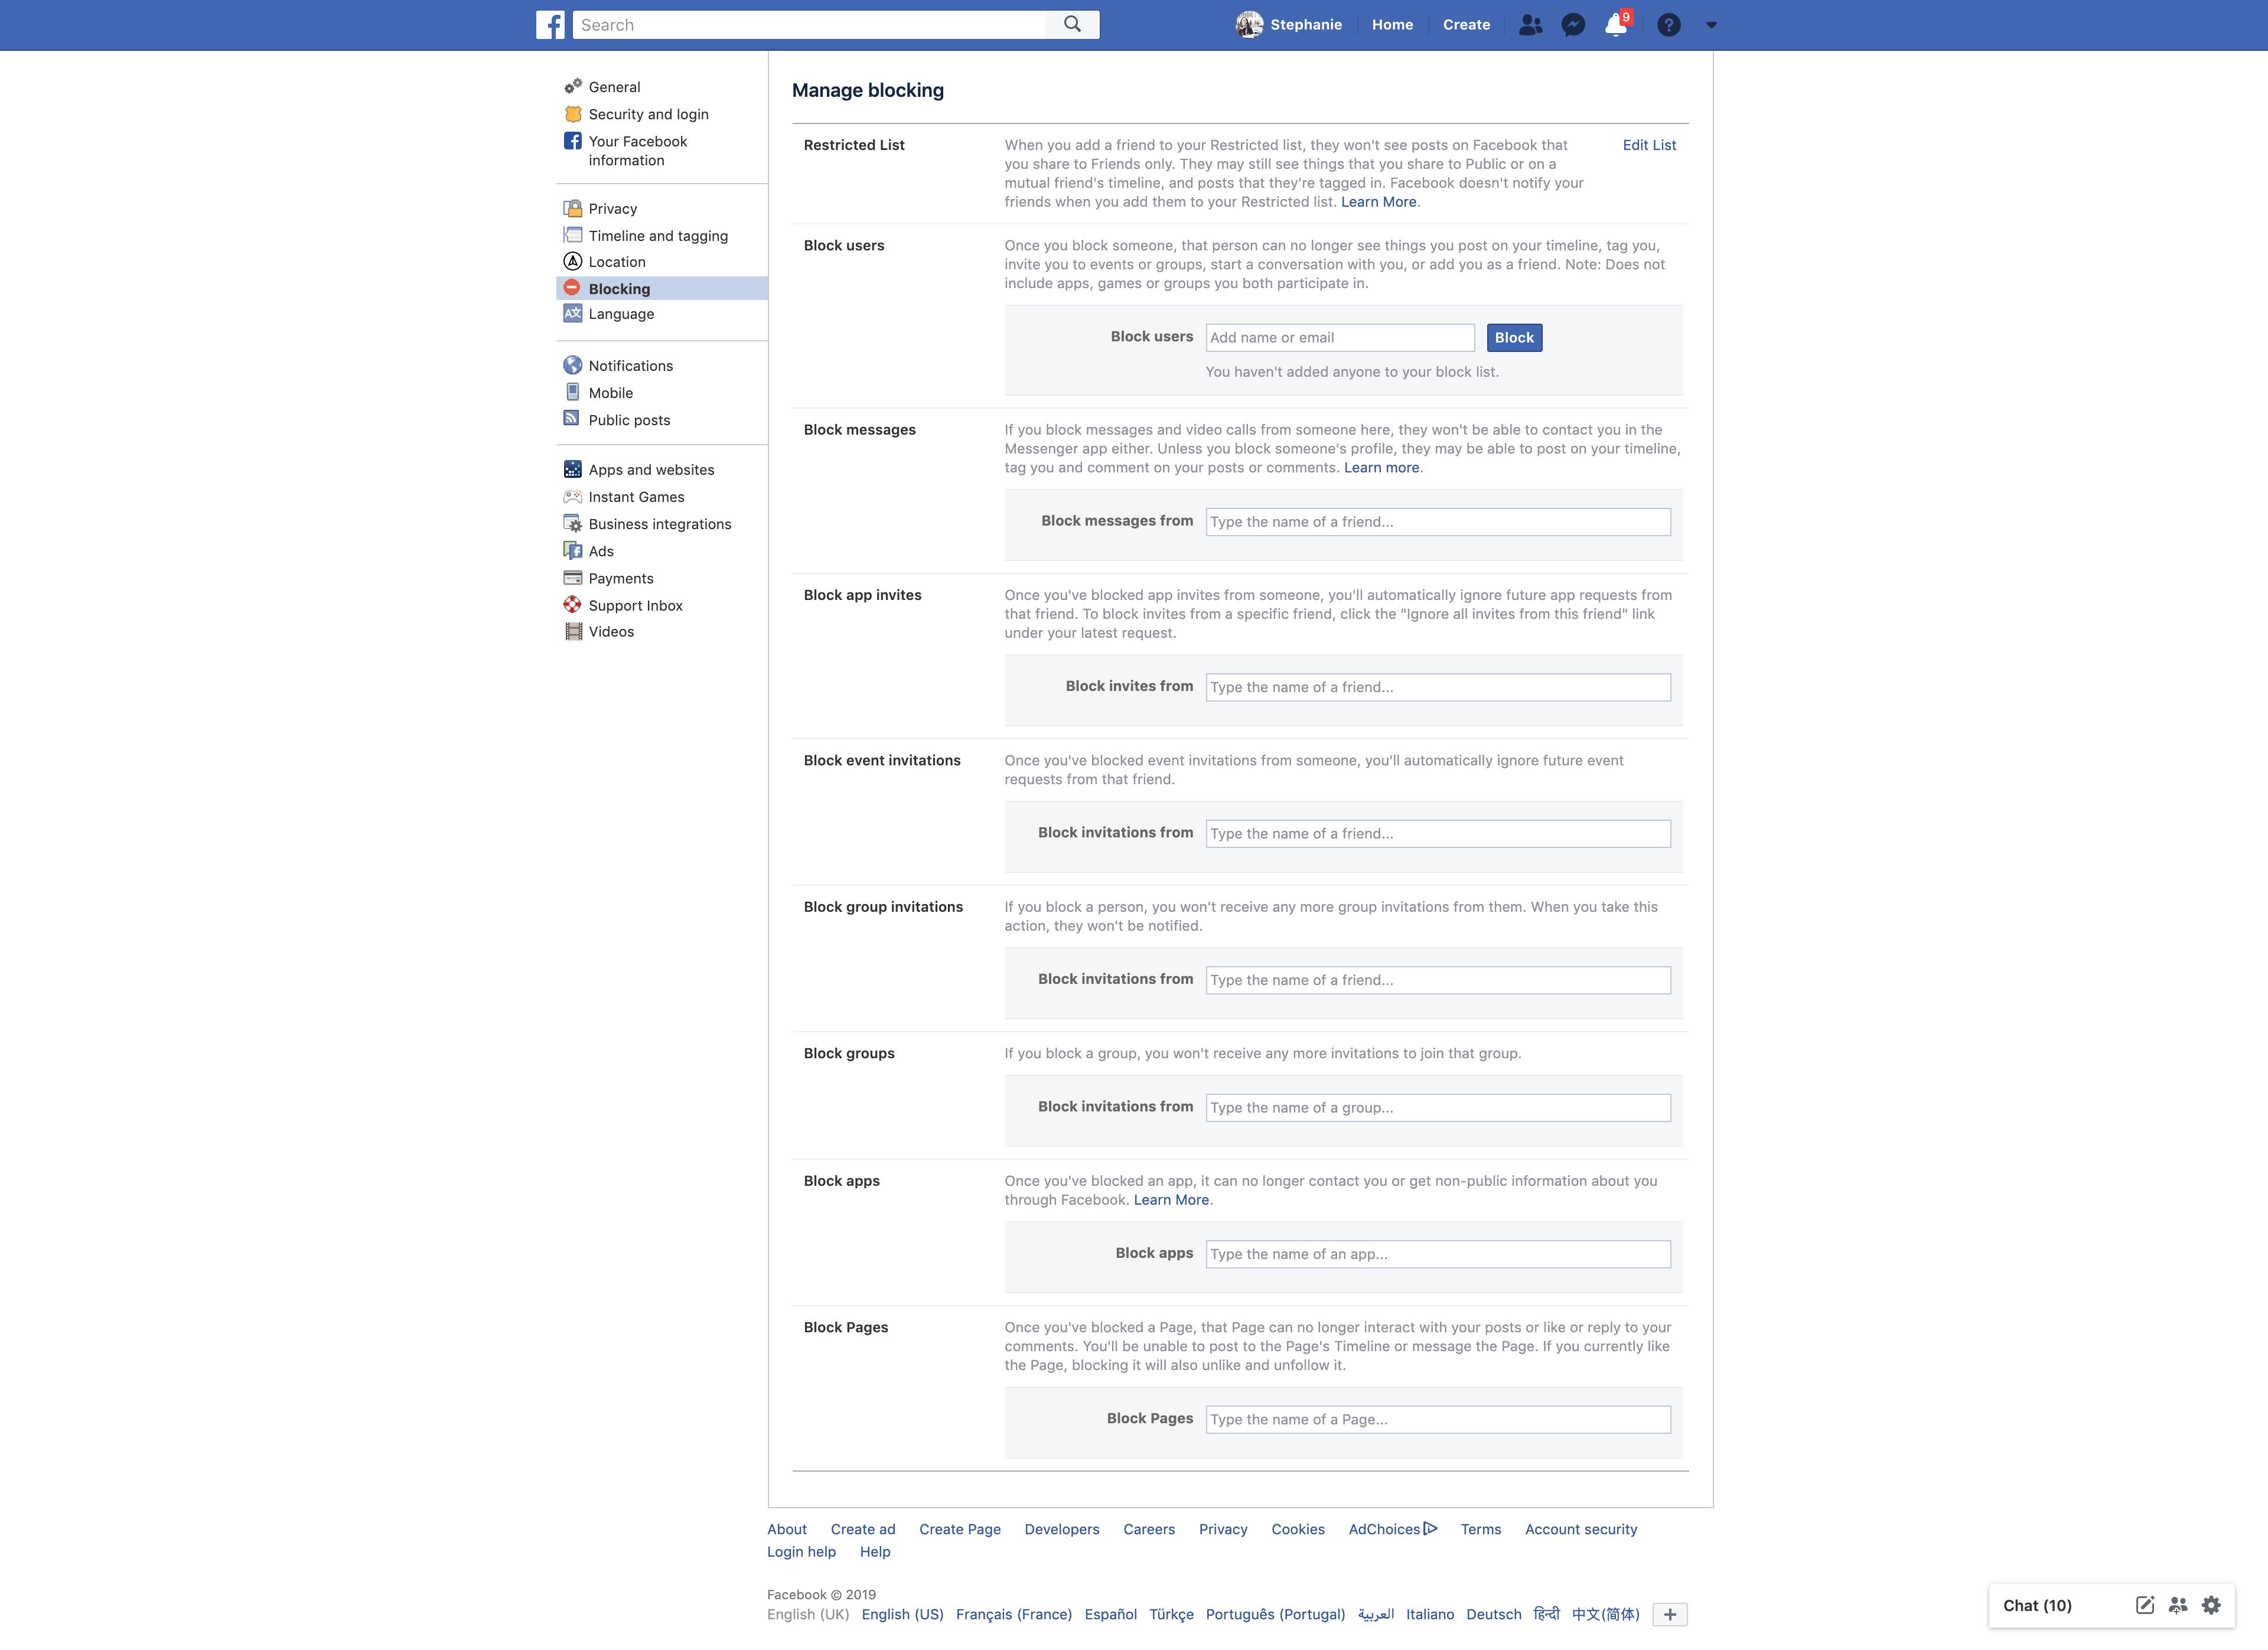 Manage Blocking by Facebook Settings  - UI Garage - The database of UI